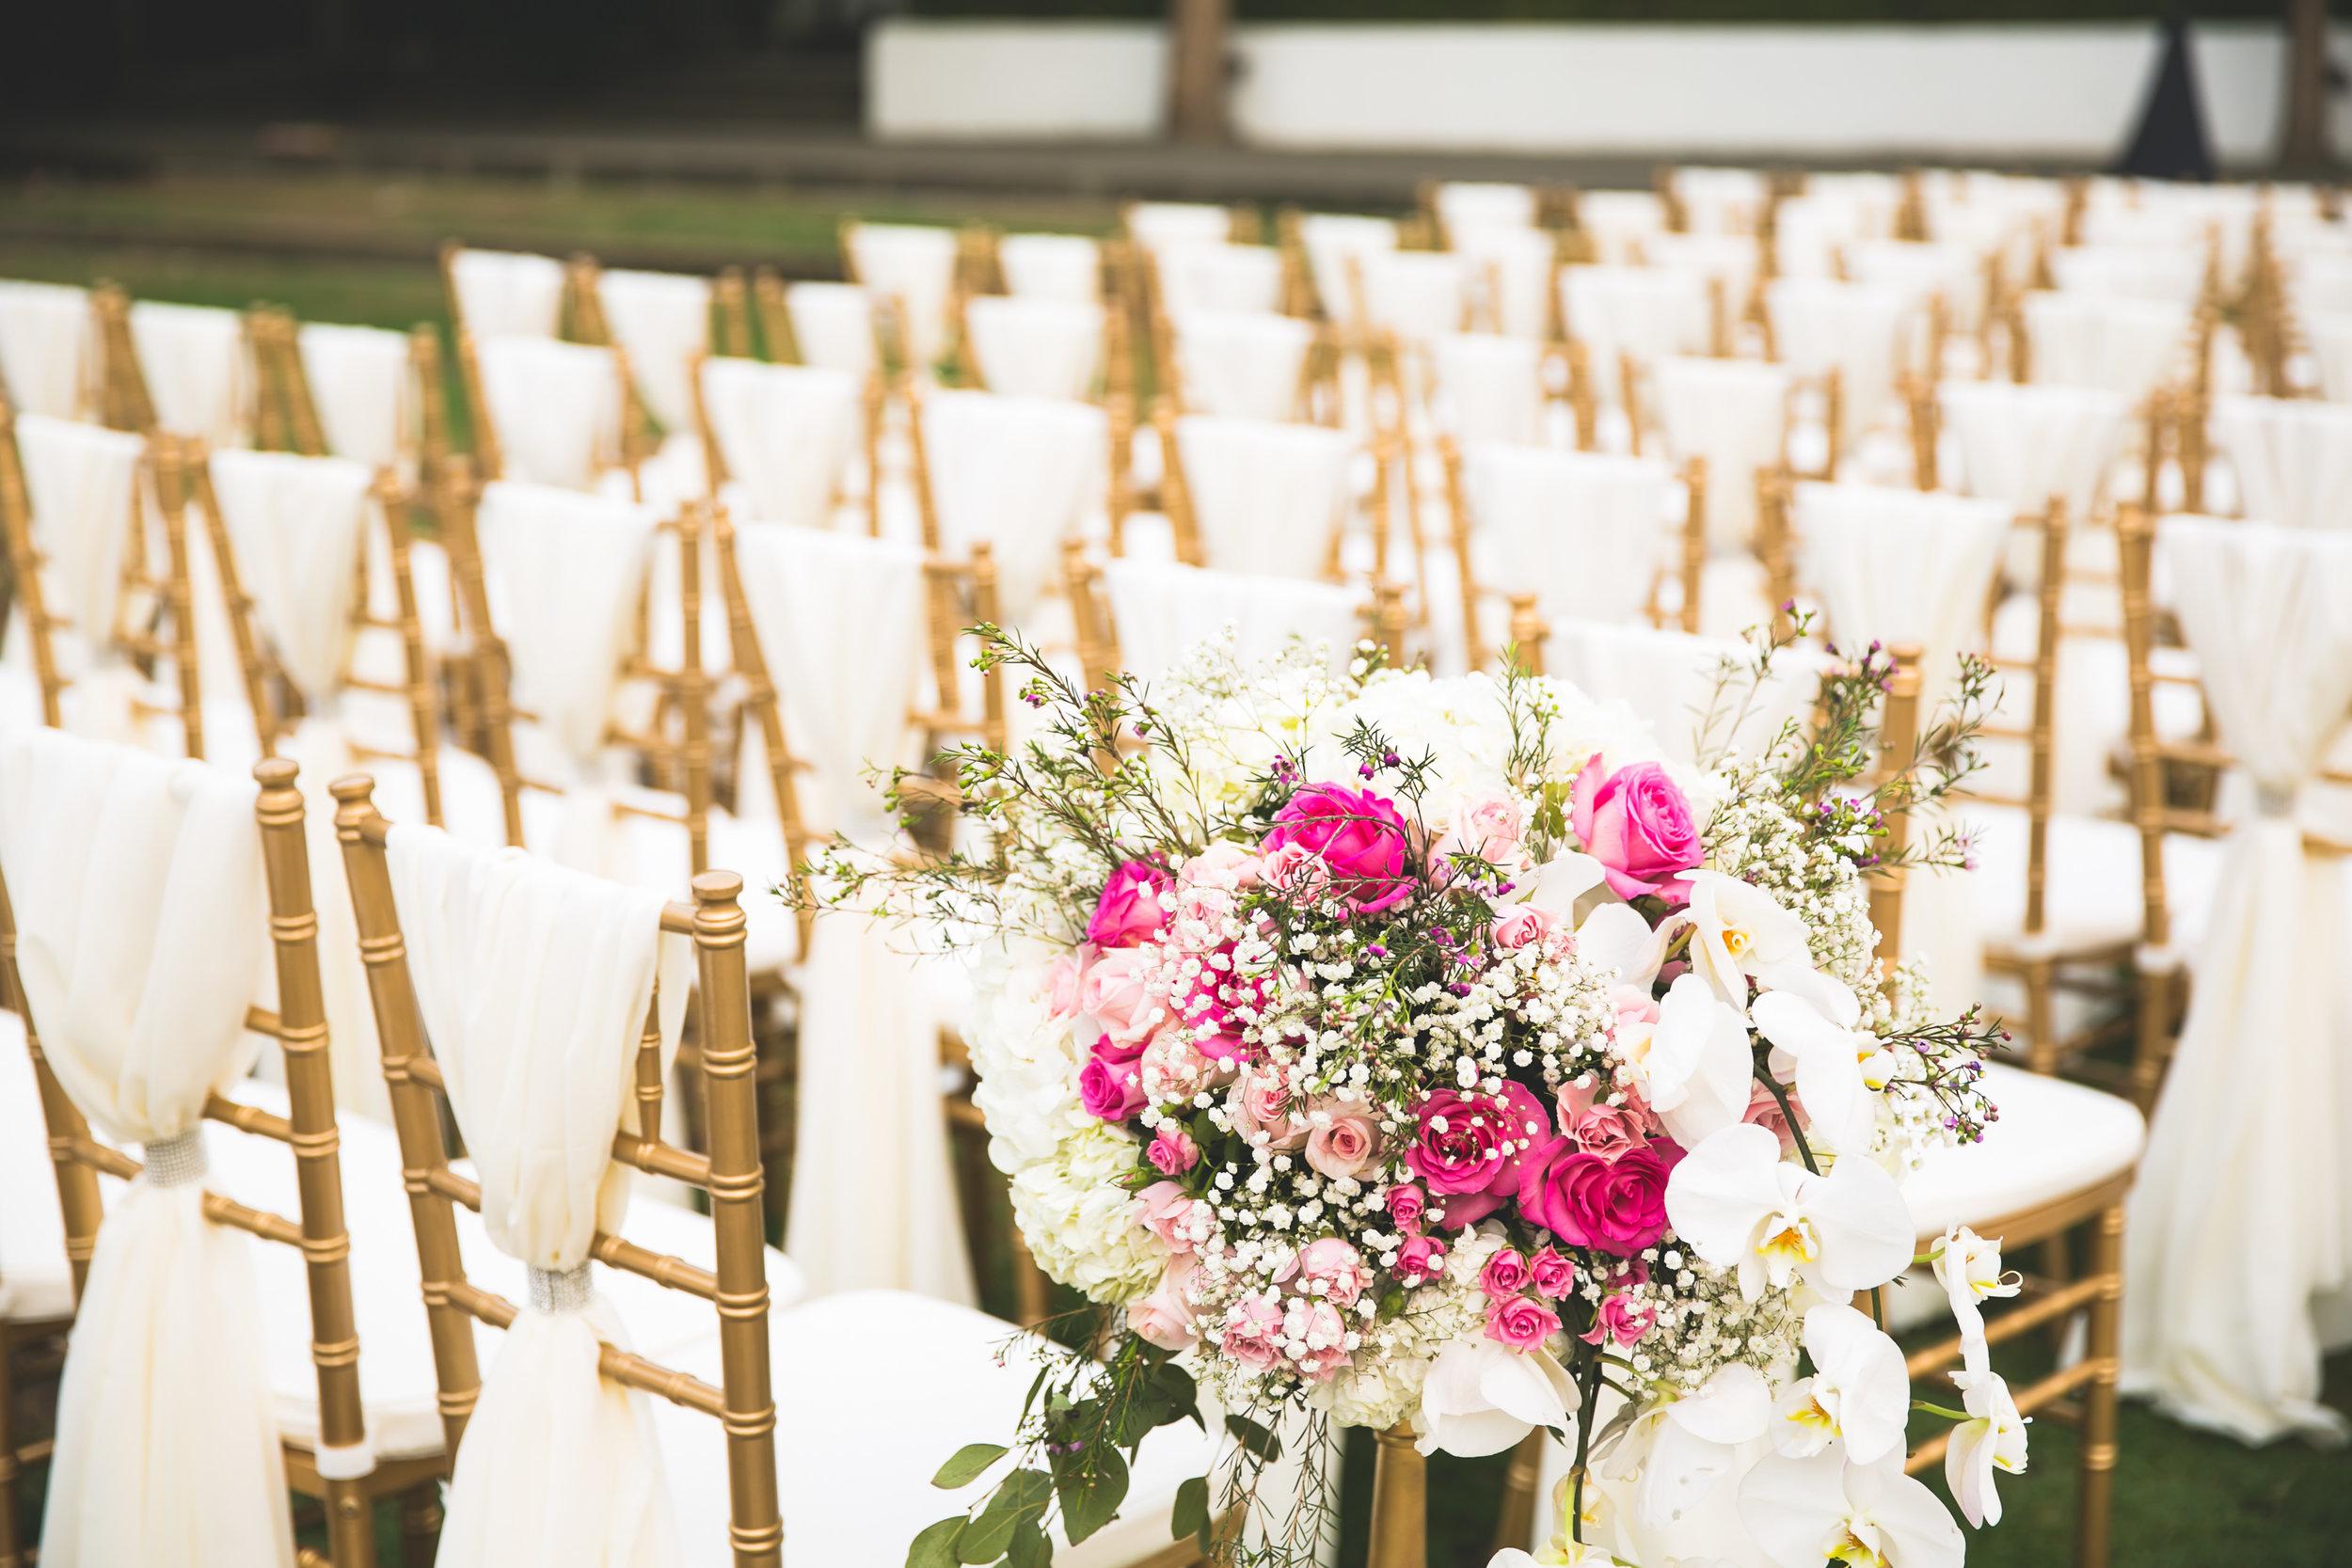 karina_asresh_wedding-0123.jpg